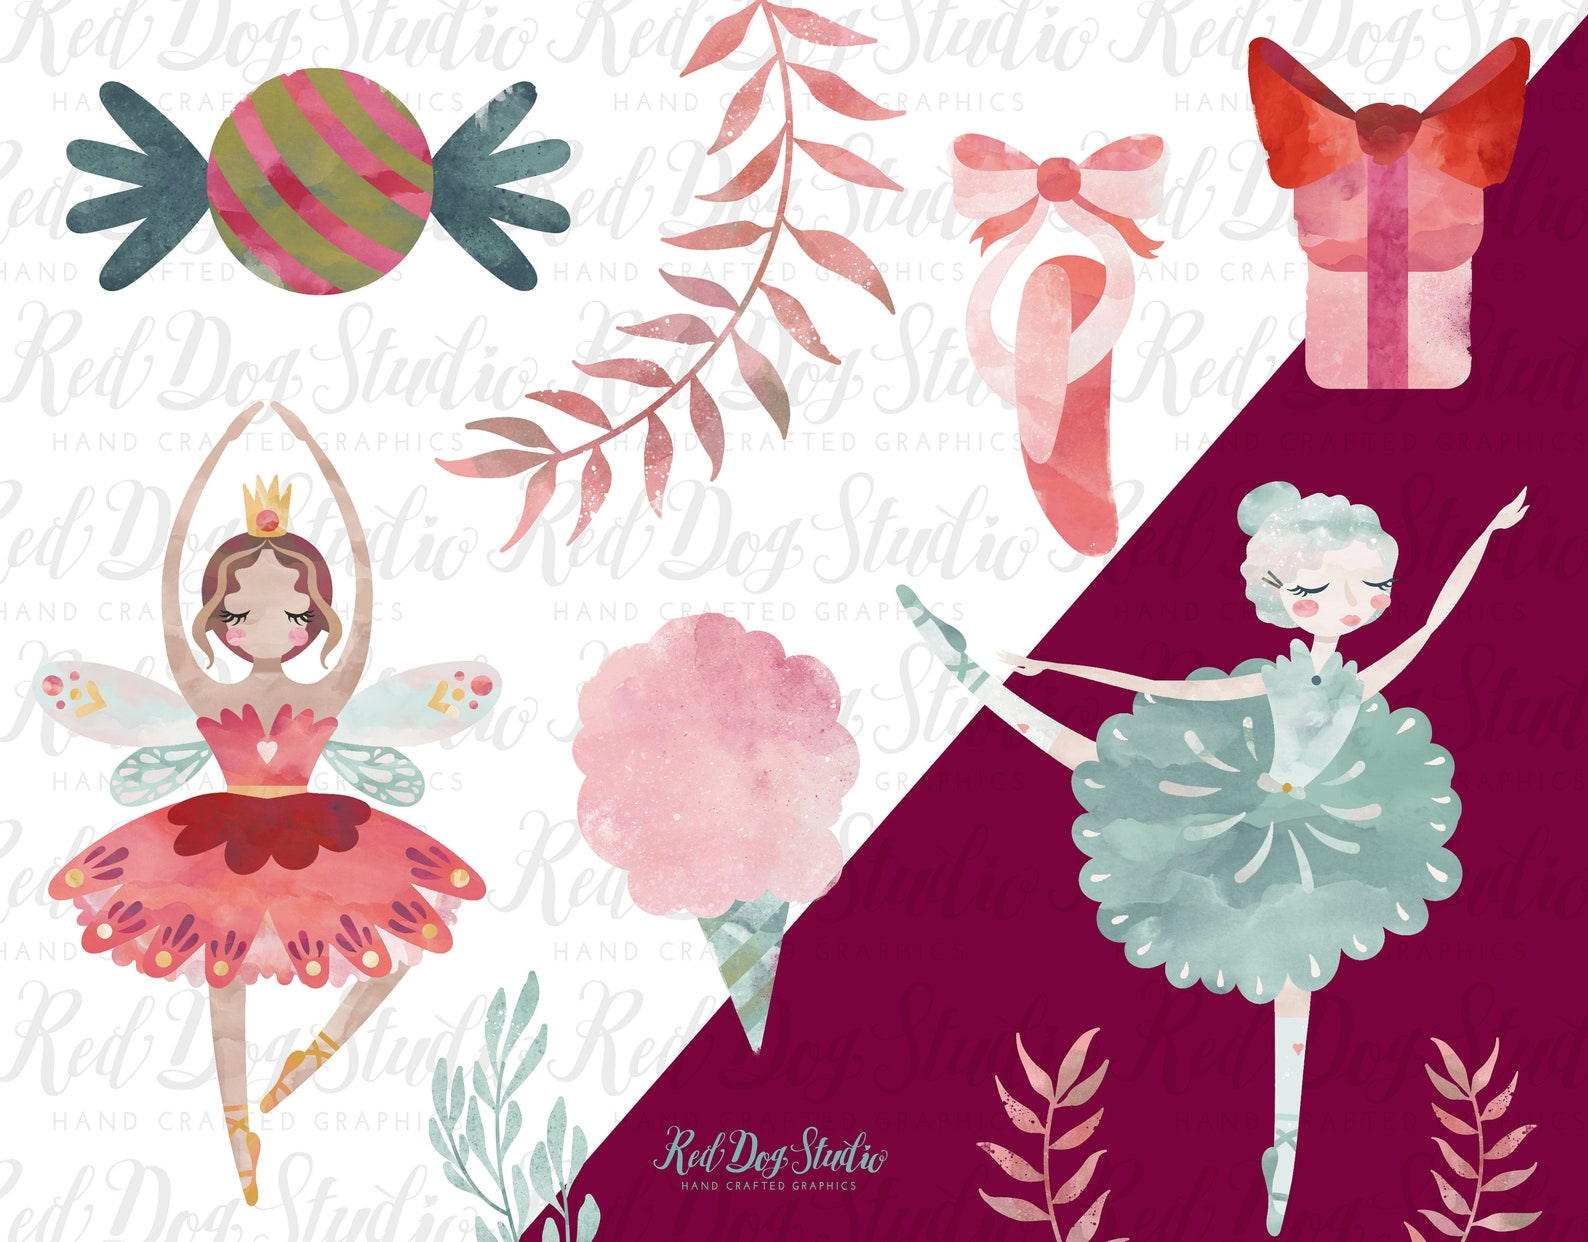 sugar plum fairy watercolor clipart nutcracker ballet clip art graphics, christmas ballerina, swan ballet shoes, snowglobe, cand